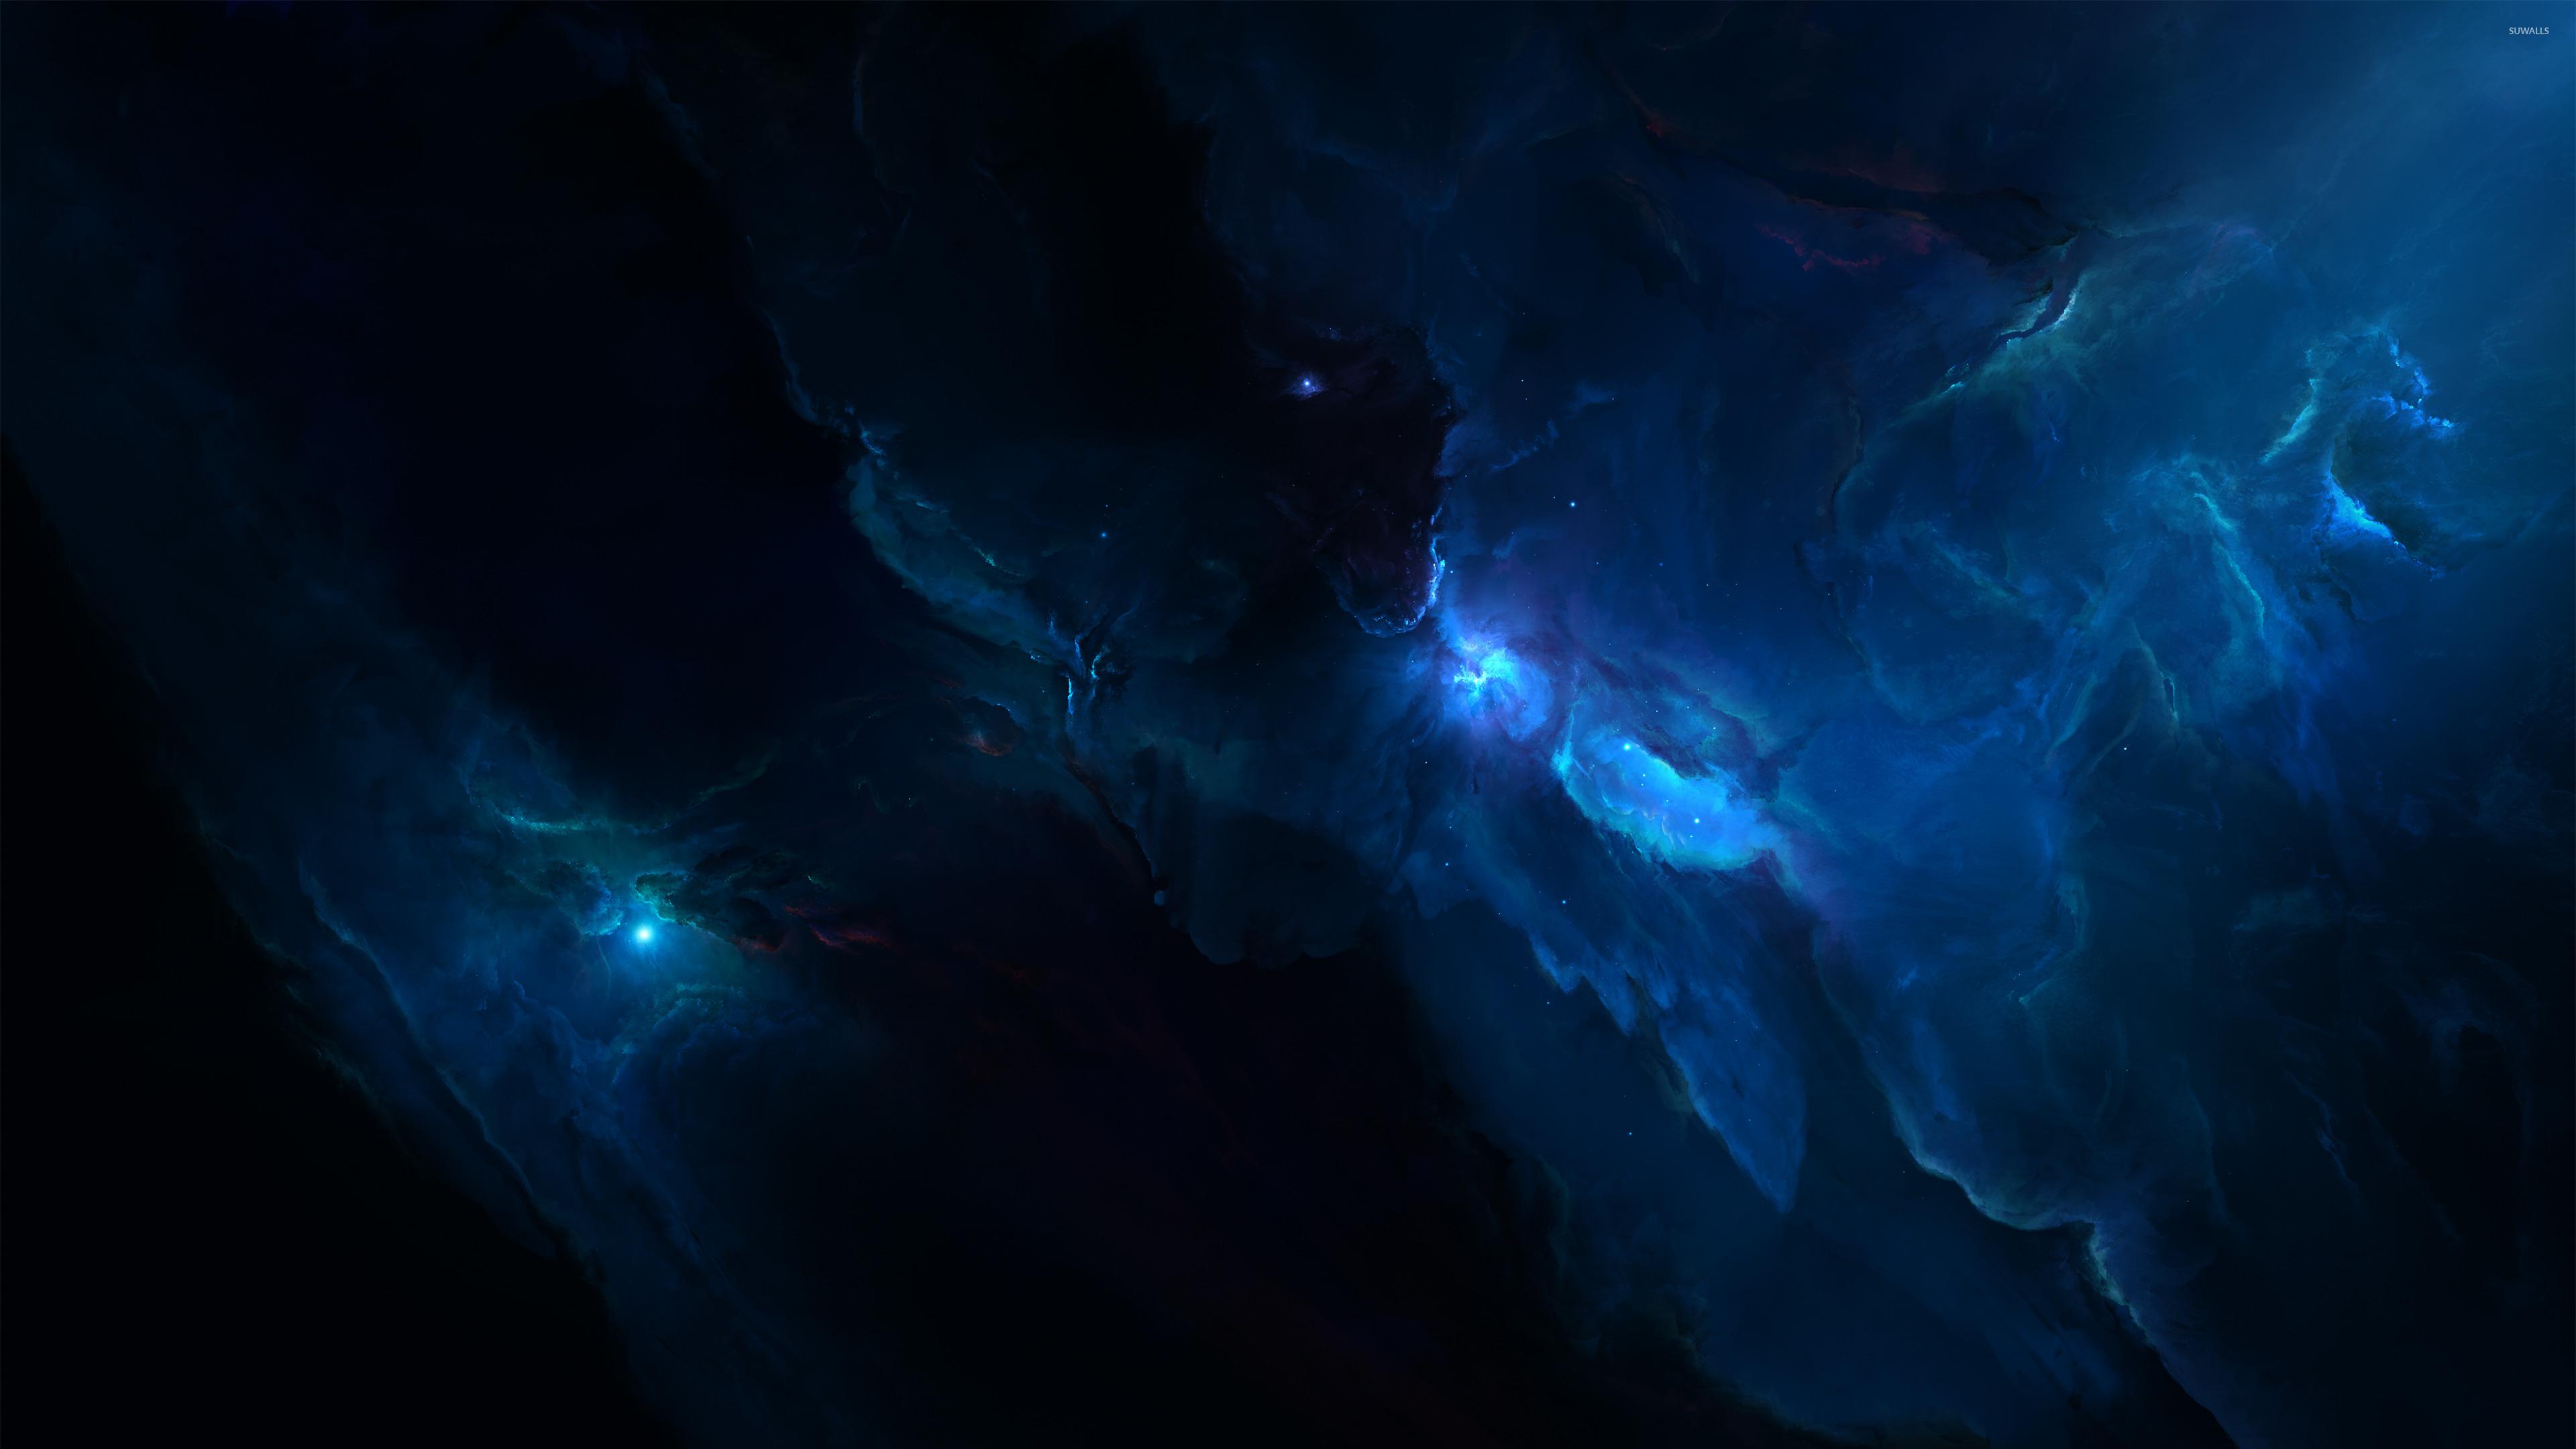 Blue nebula [2] wallpaper - Space wallpapers - #37911 Blue Nebula Wallpaper Widescreen